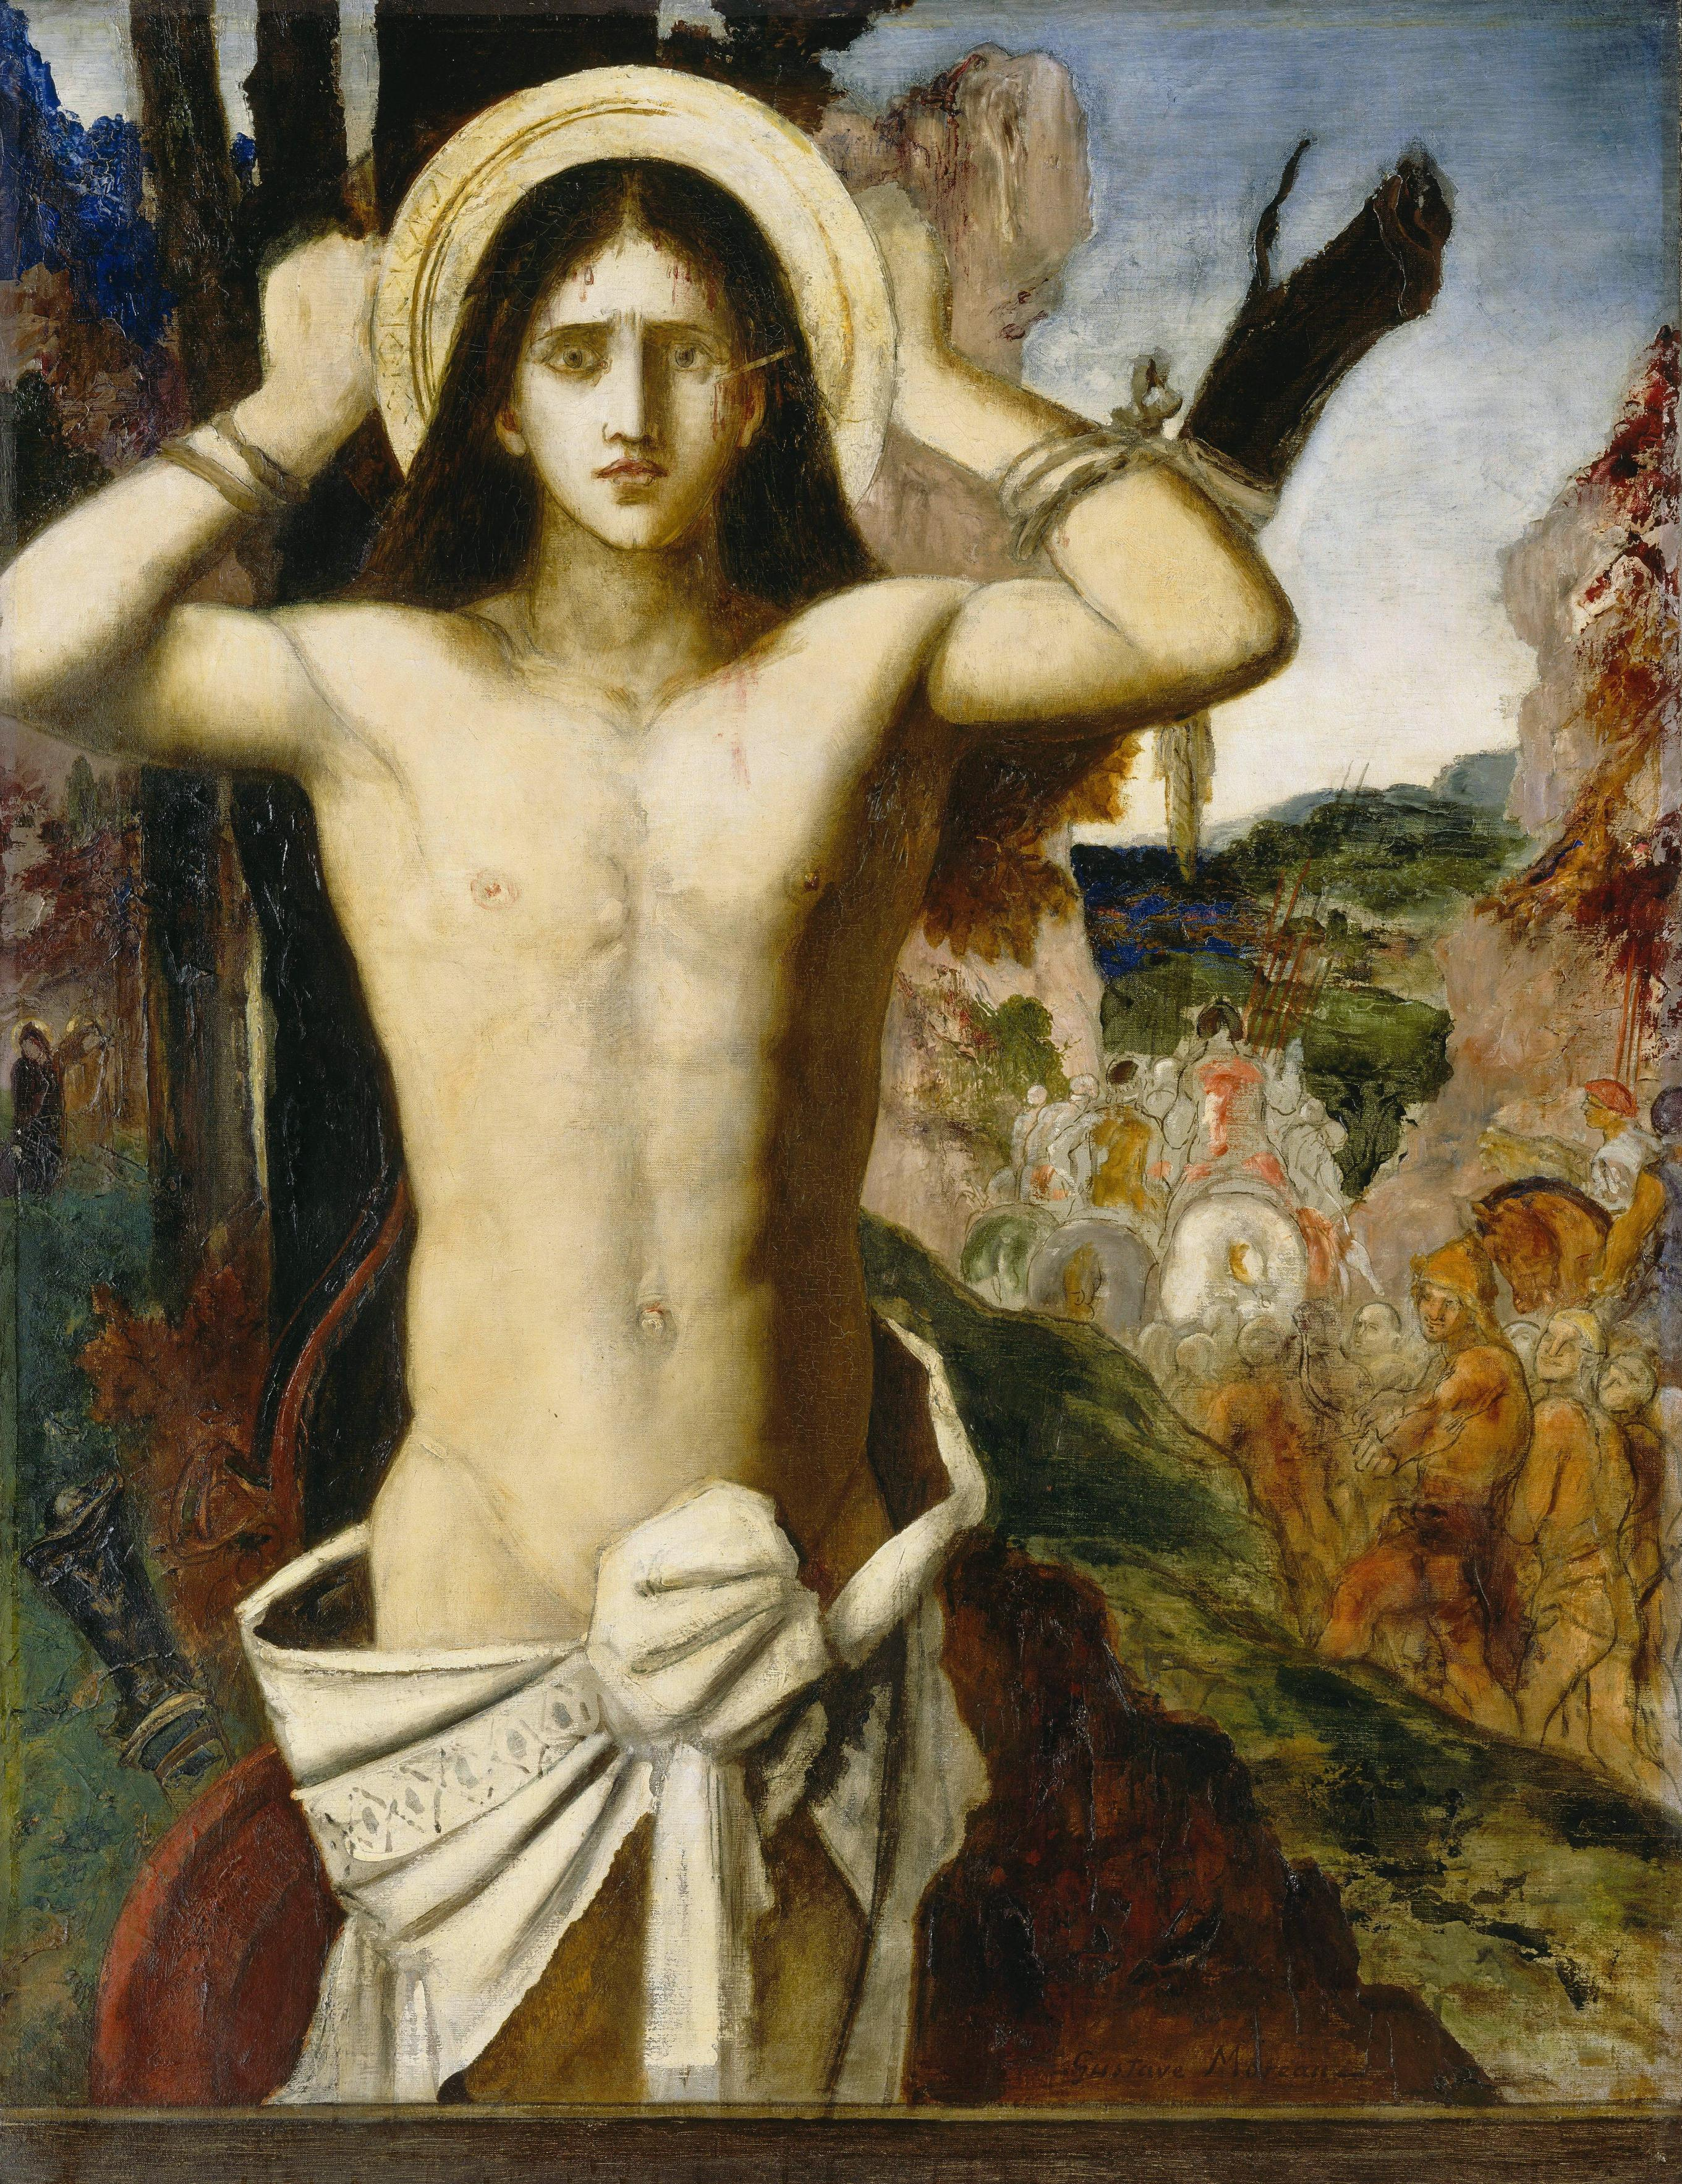 Святой Себастьян (115 х 90 см) (Париж. музей Гюстава Моро)